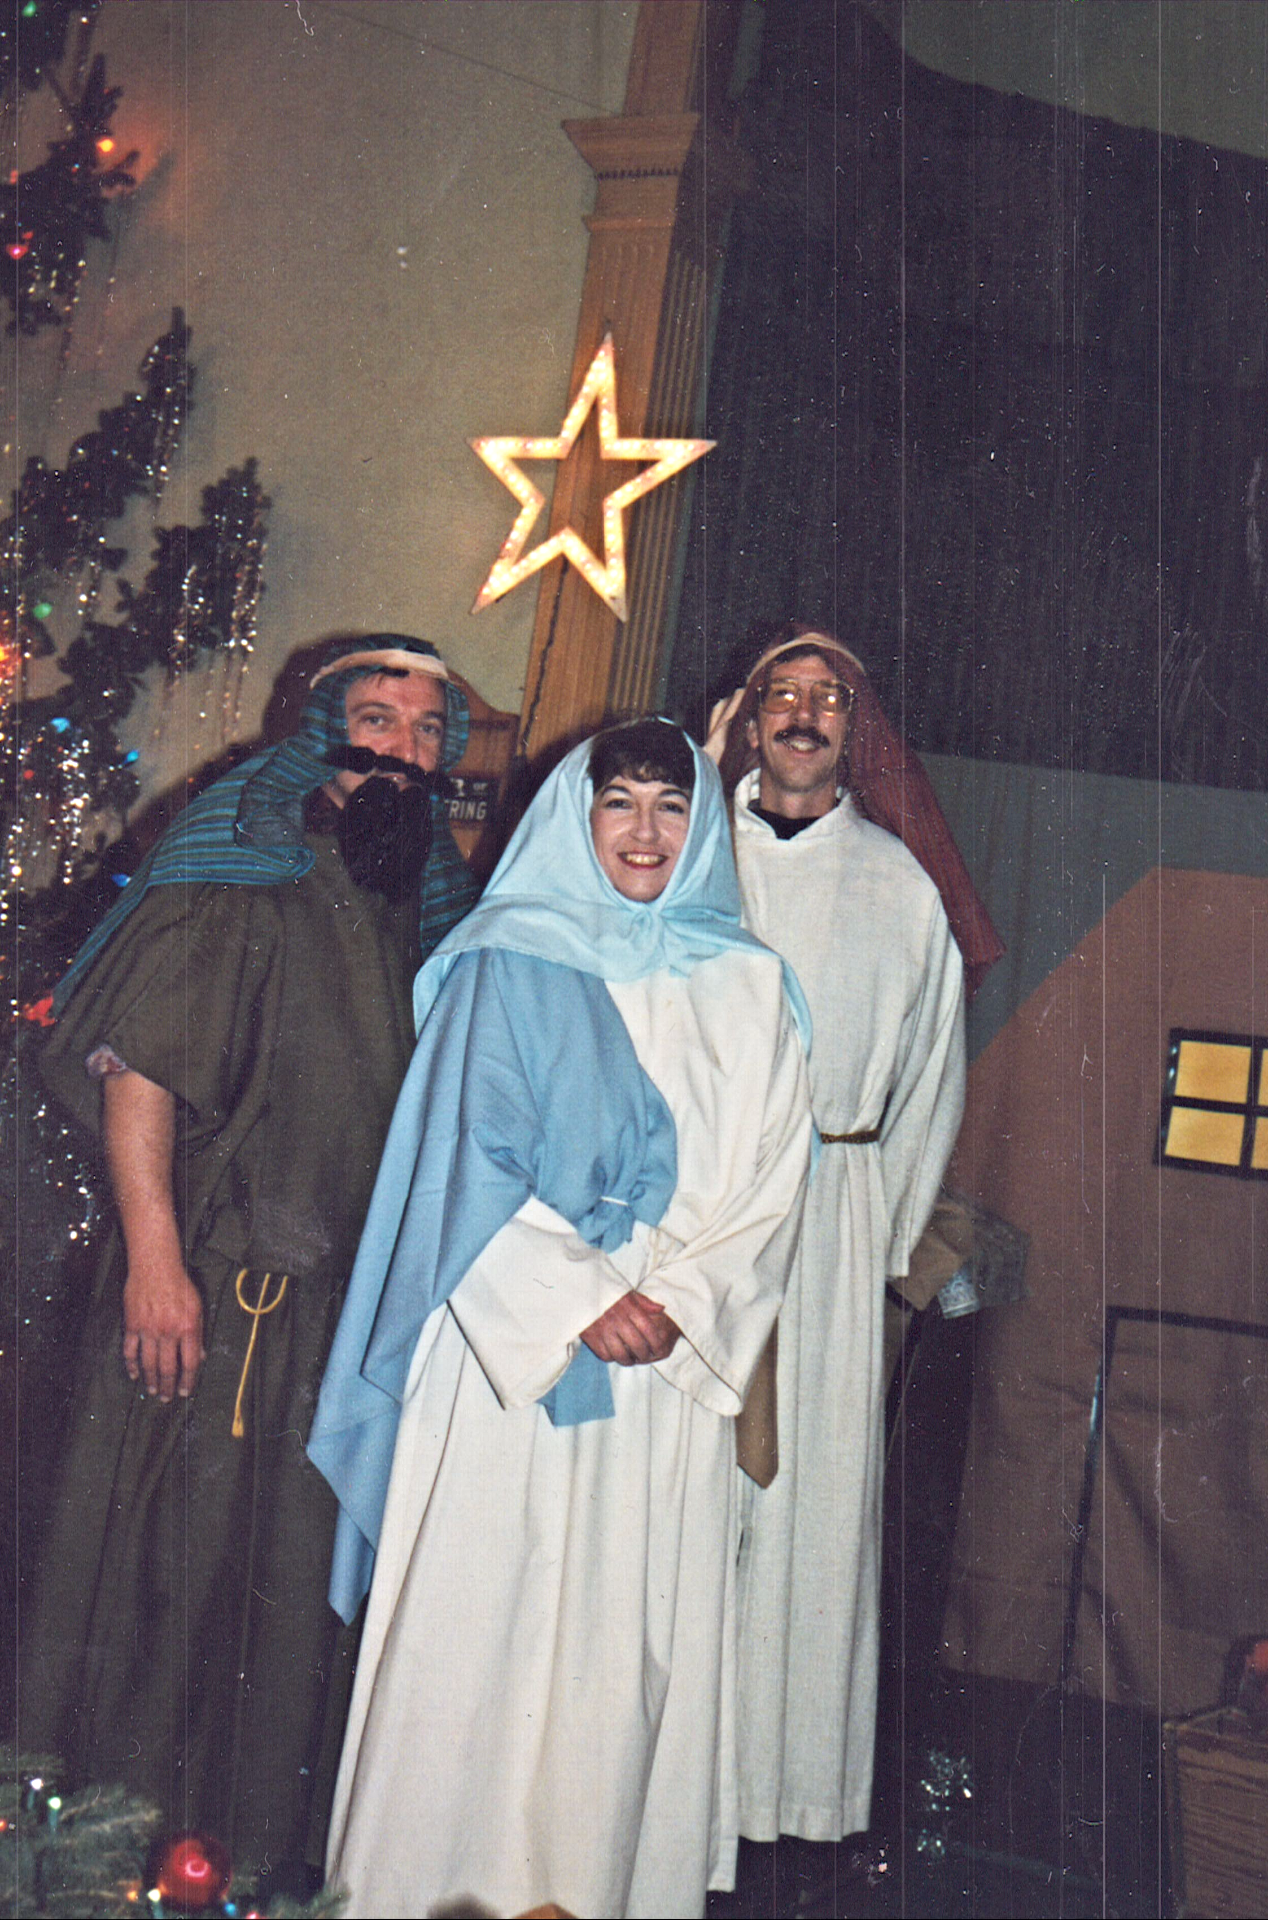 Susan, Dave Lorenz, Dan Snyder